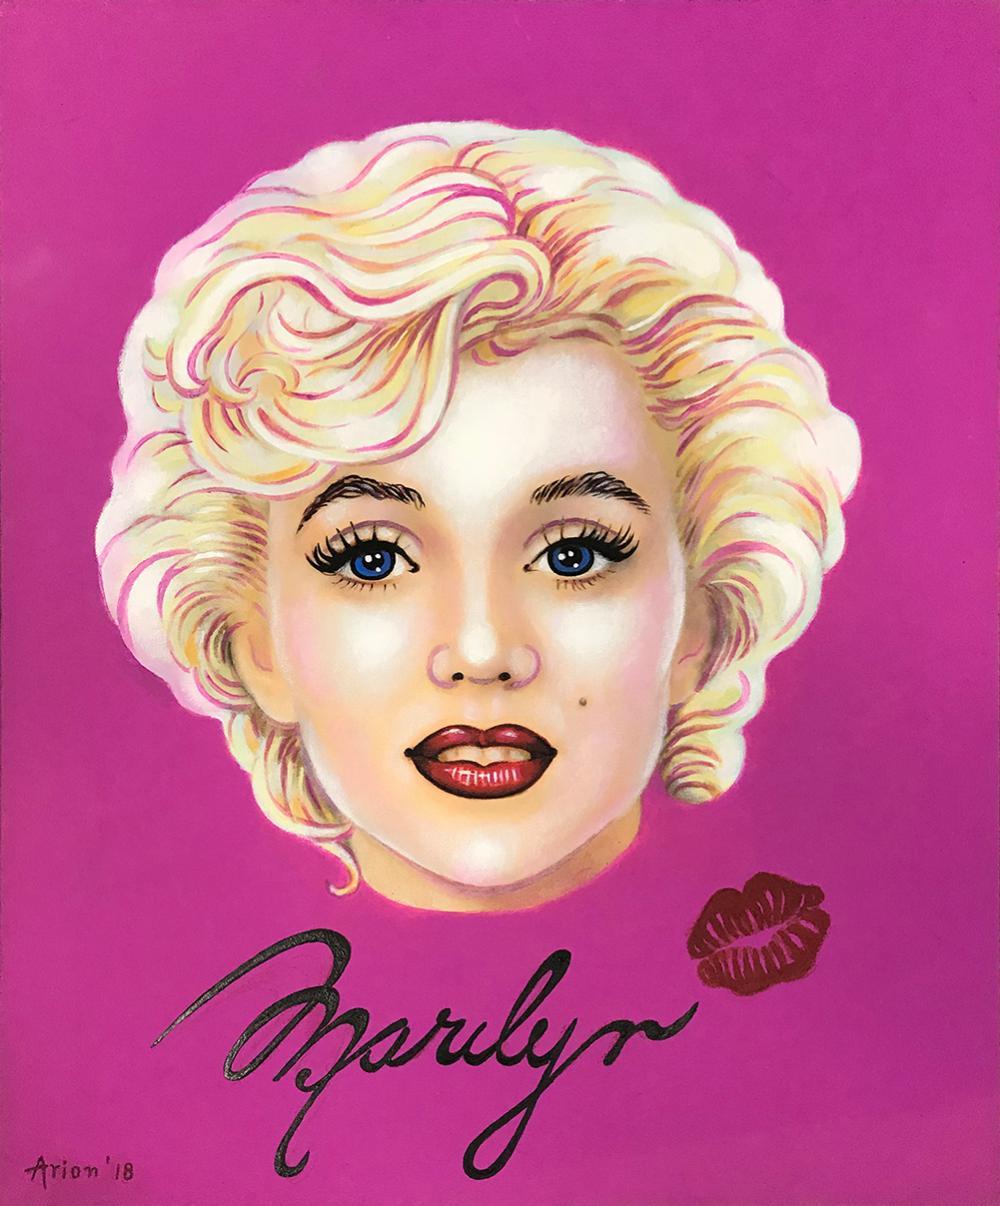 Katherine Arion original on canvas Marilyn Monroe